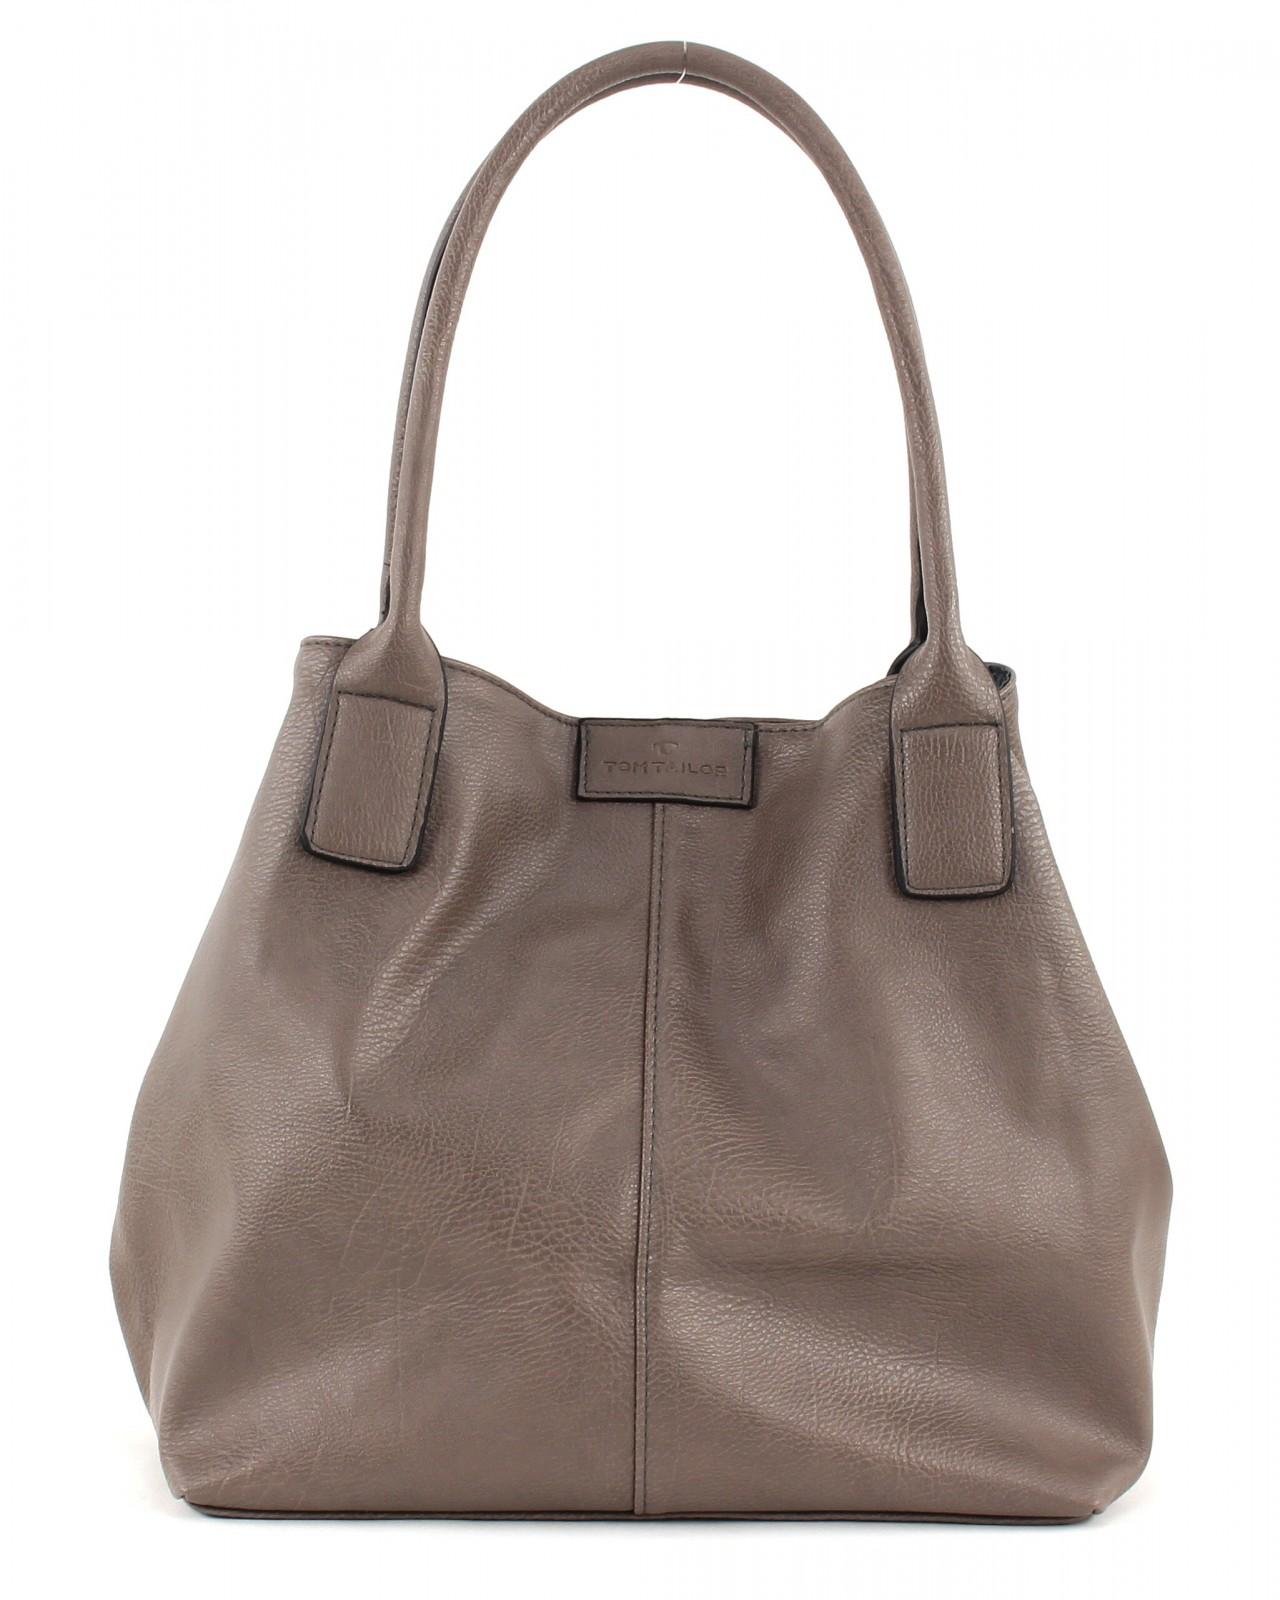 tom tailor miripu shopper braun tasche handtasche. Black Bedroom Furniture Sets. Home Design Ideas